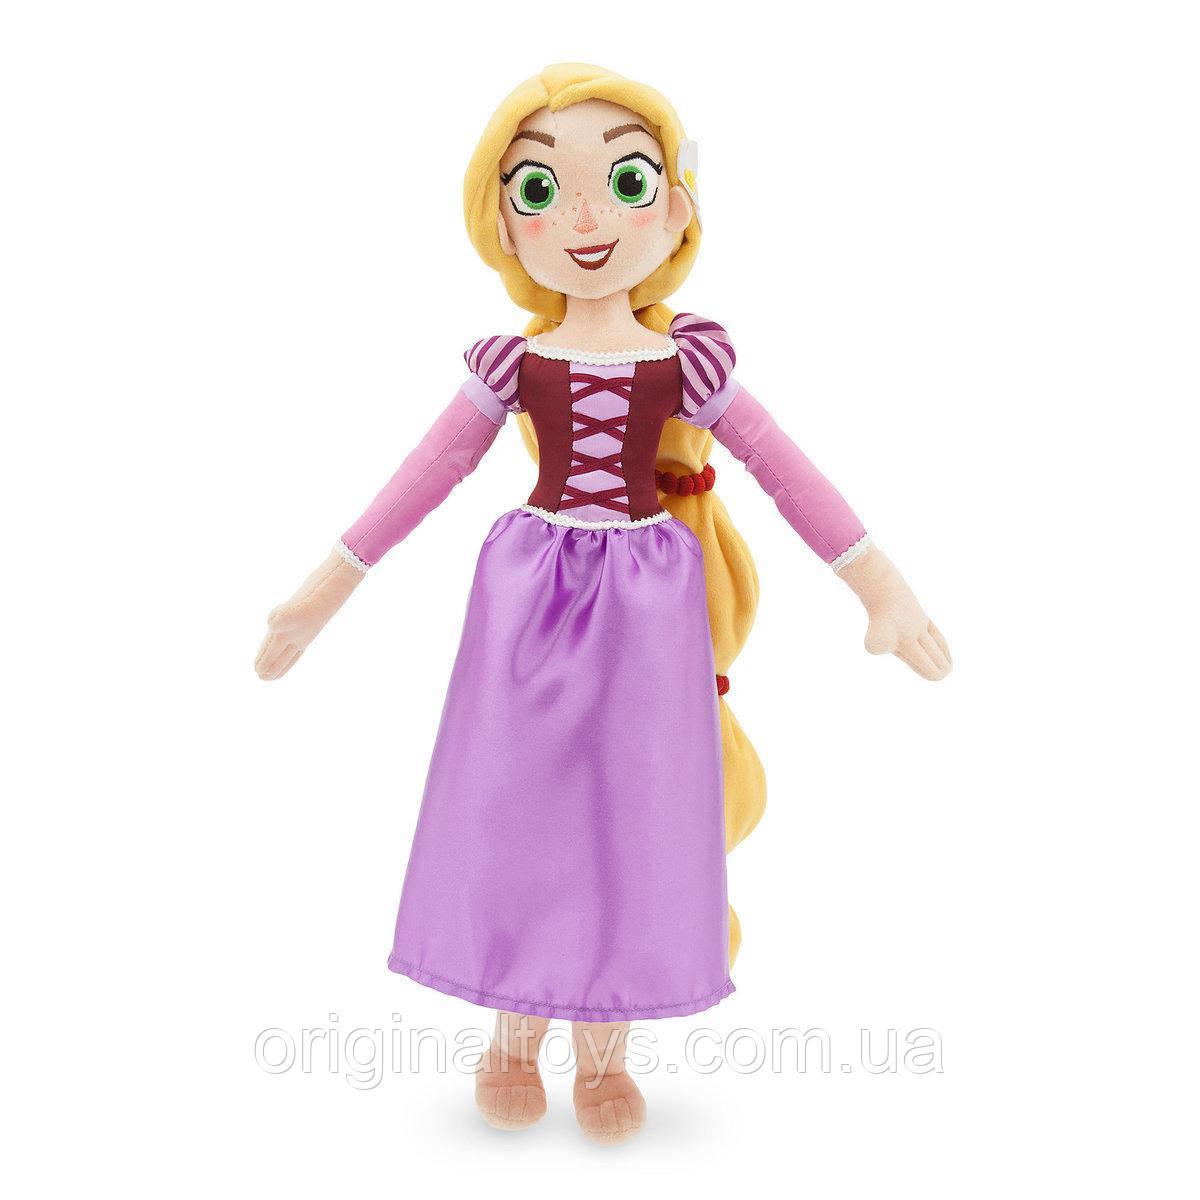 Мягкая игрушка кукла Рапунцель Disney 50 см